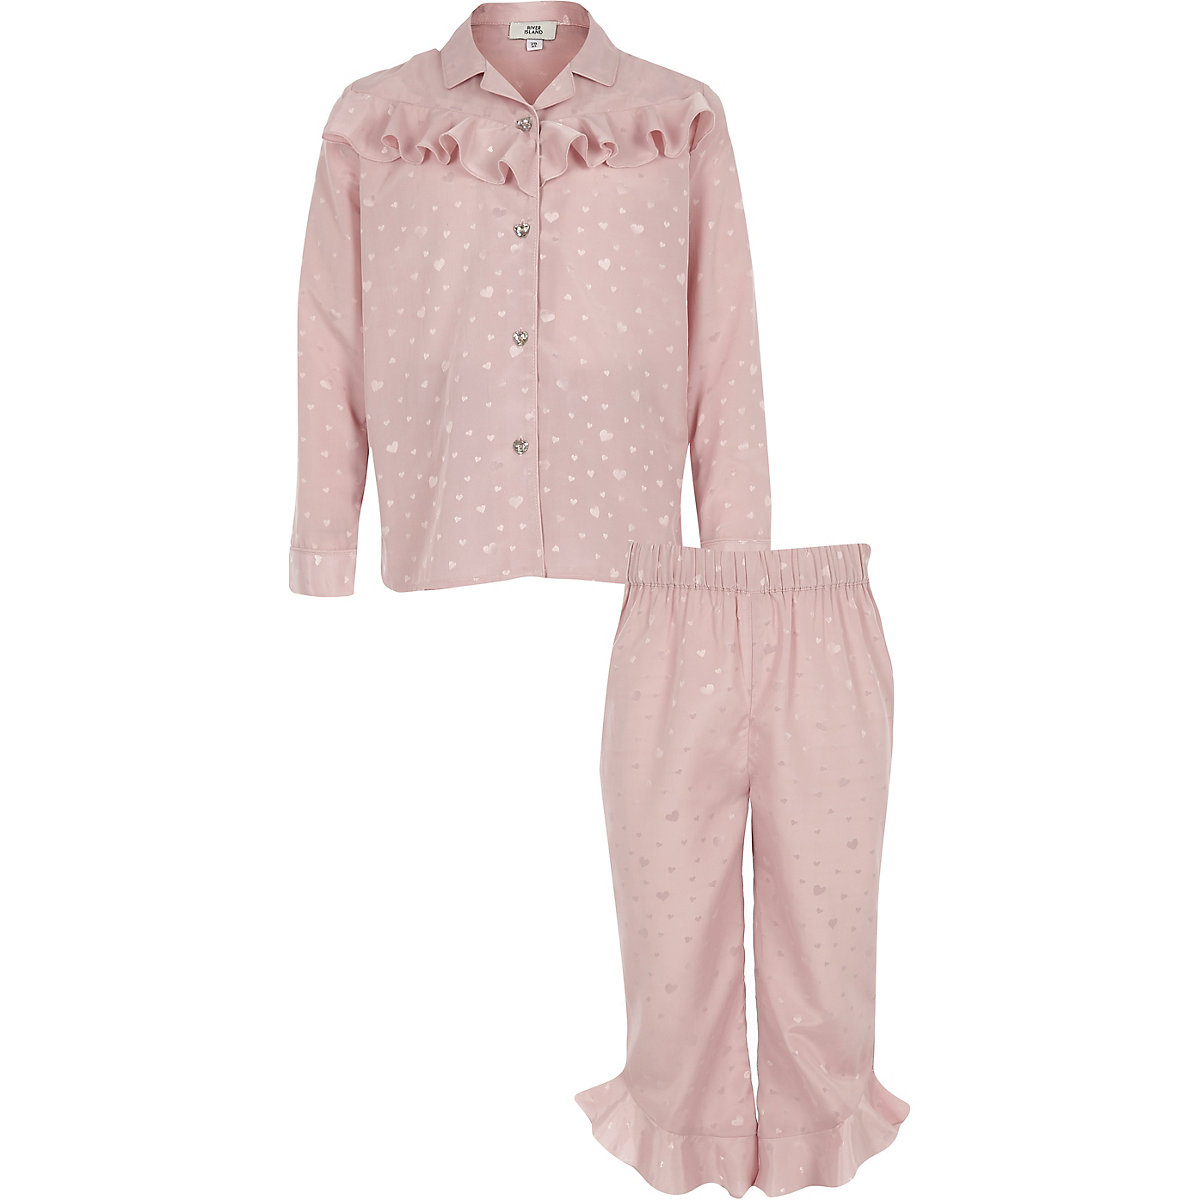 Girls pink heart satin ruffle pajama set